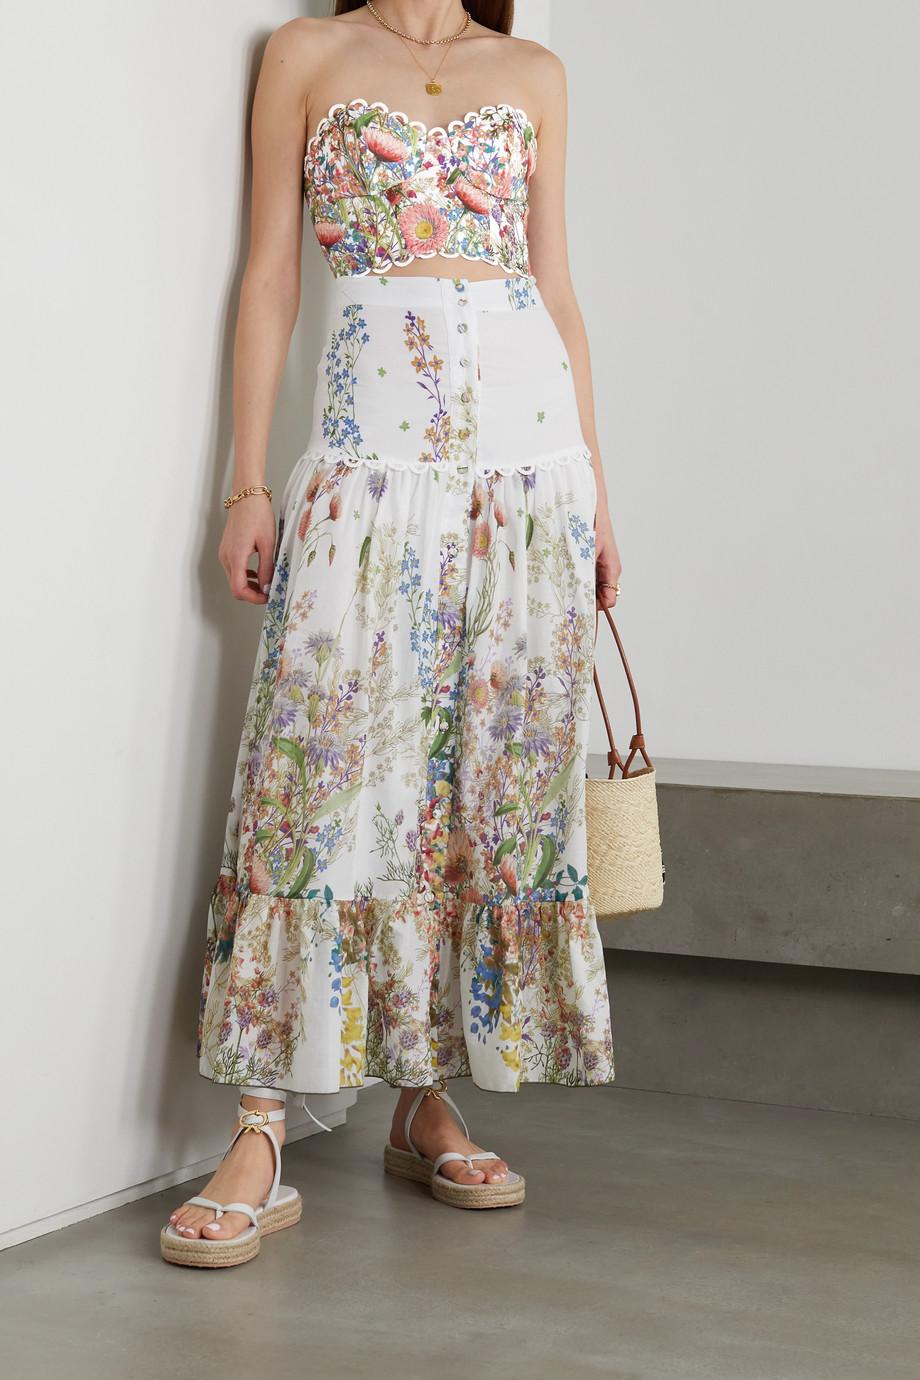 Charo Ruiz Lita strapless picot-trimmed floral-print cotton top